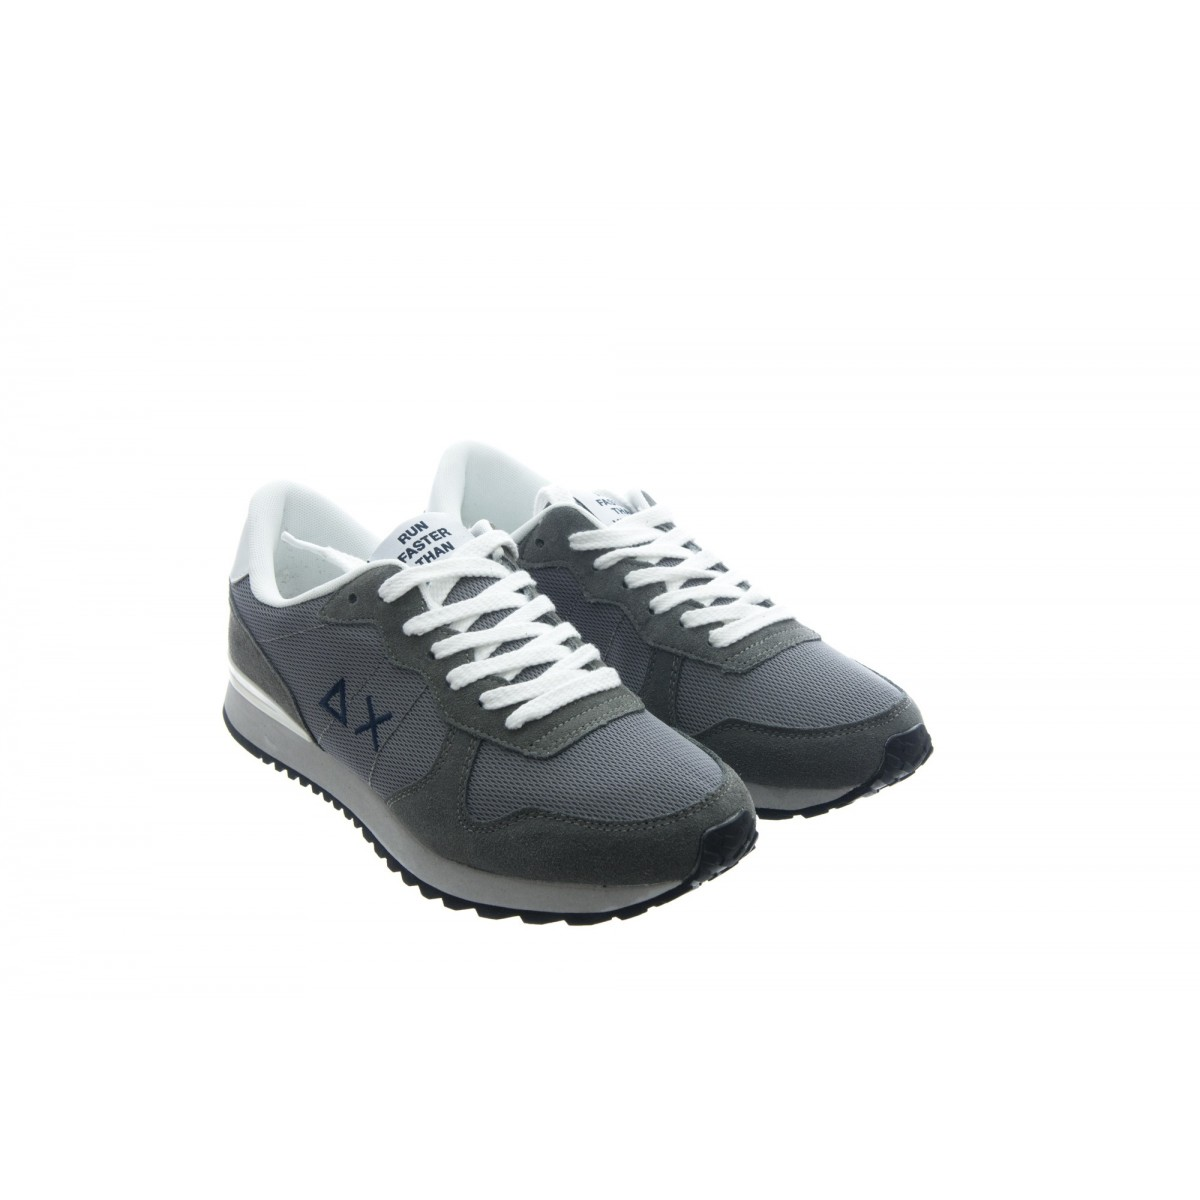 Scarpa - S0001 sneakers uomo